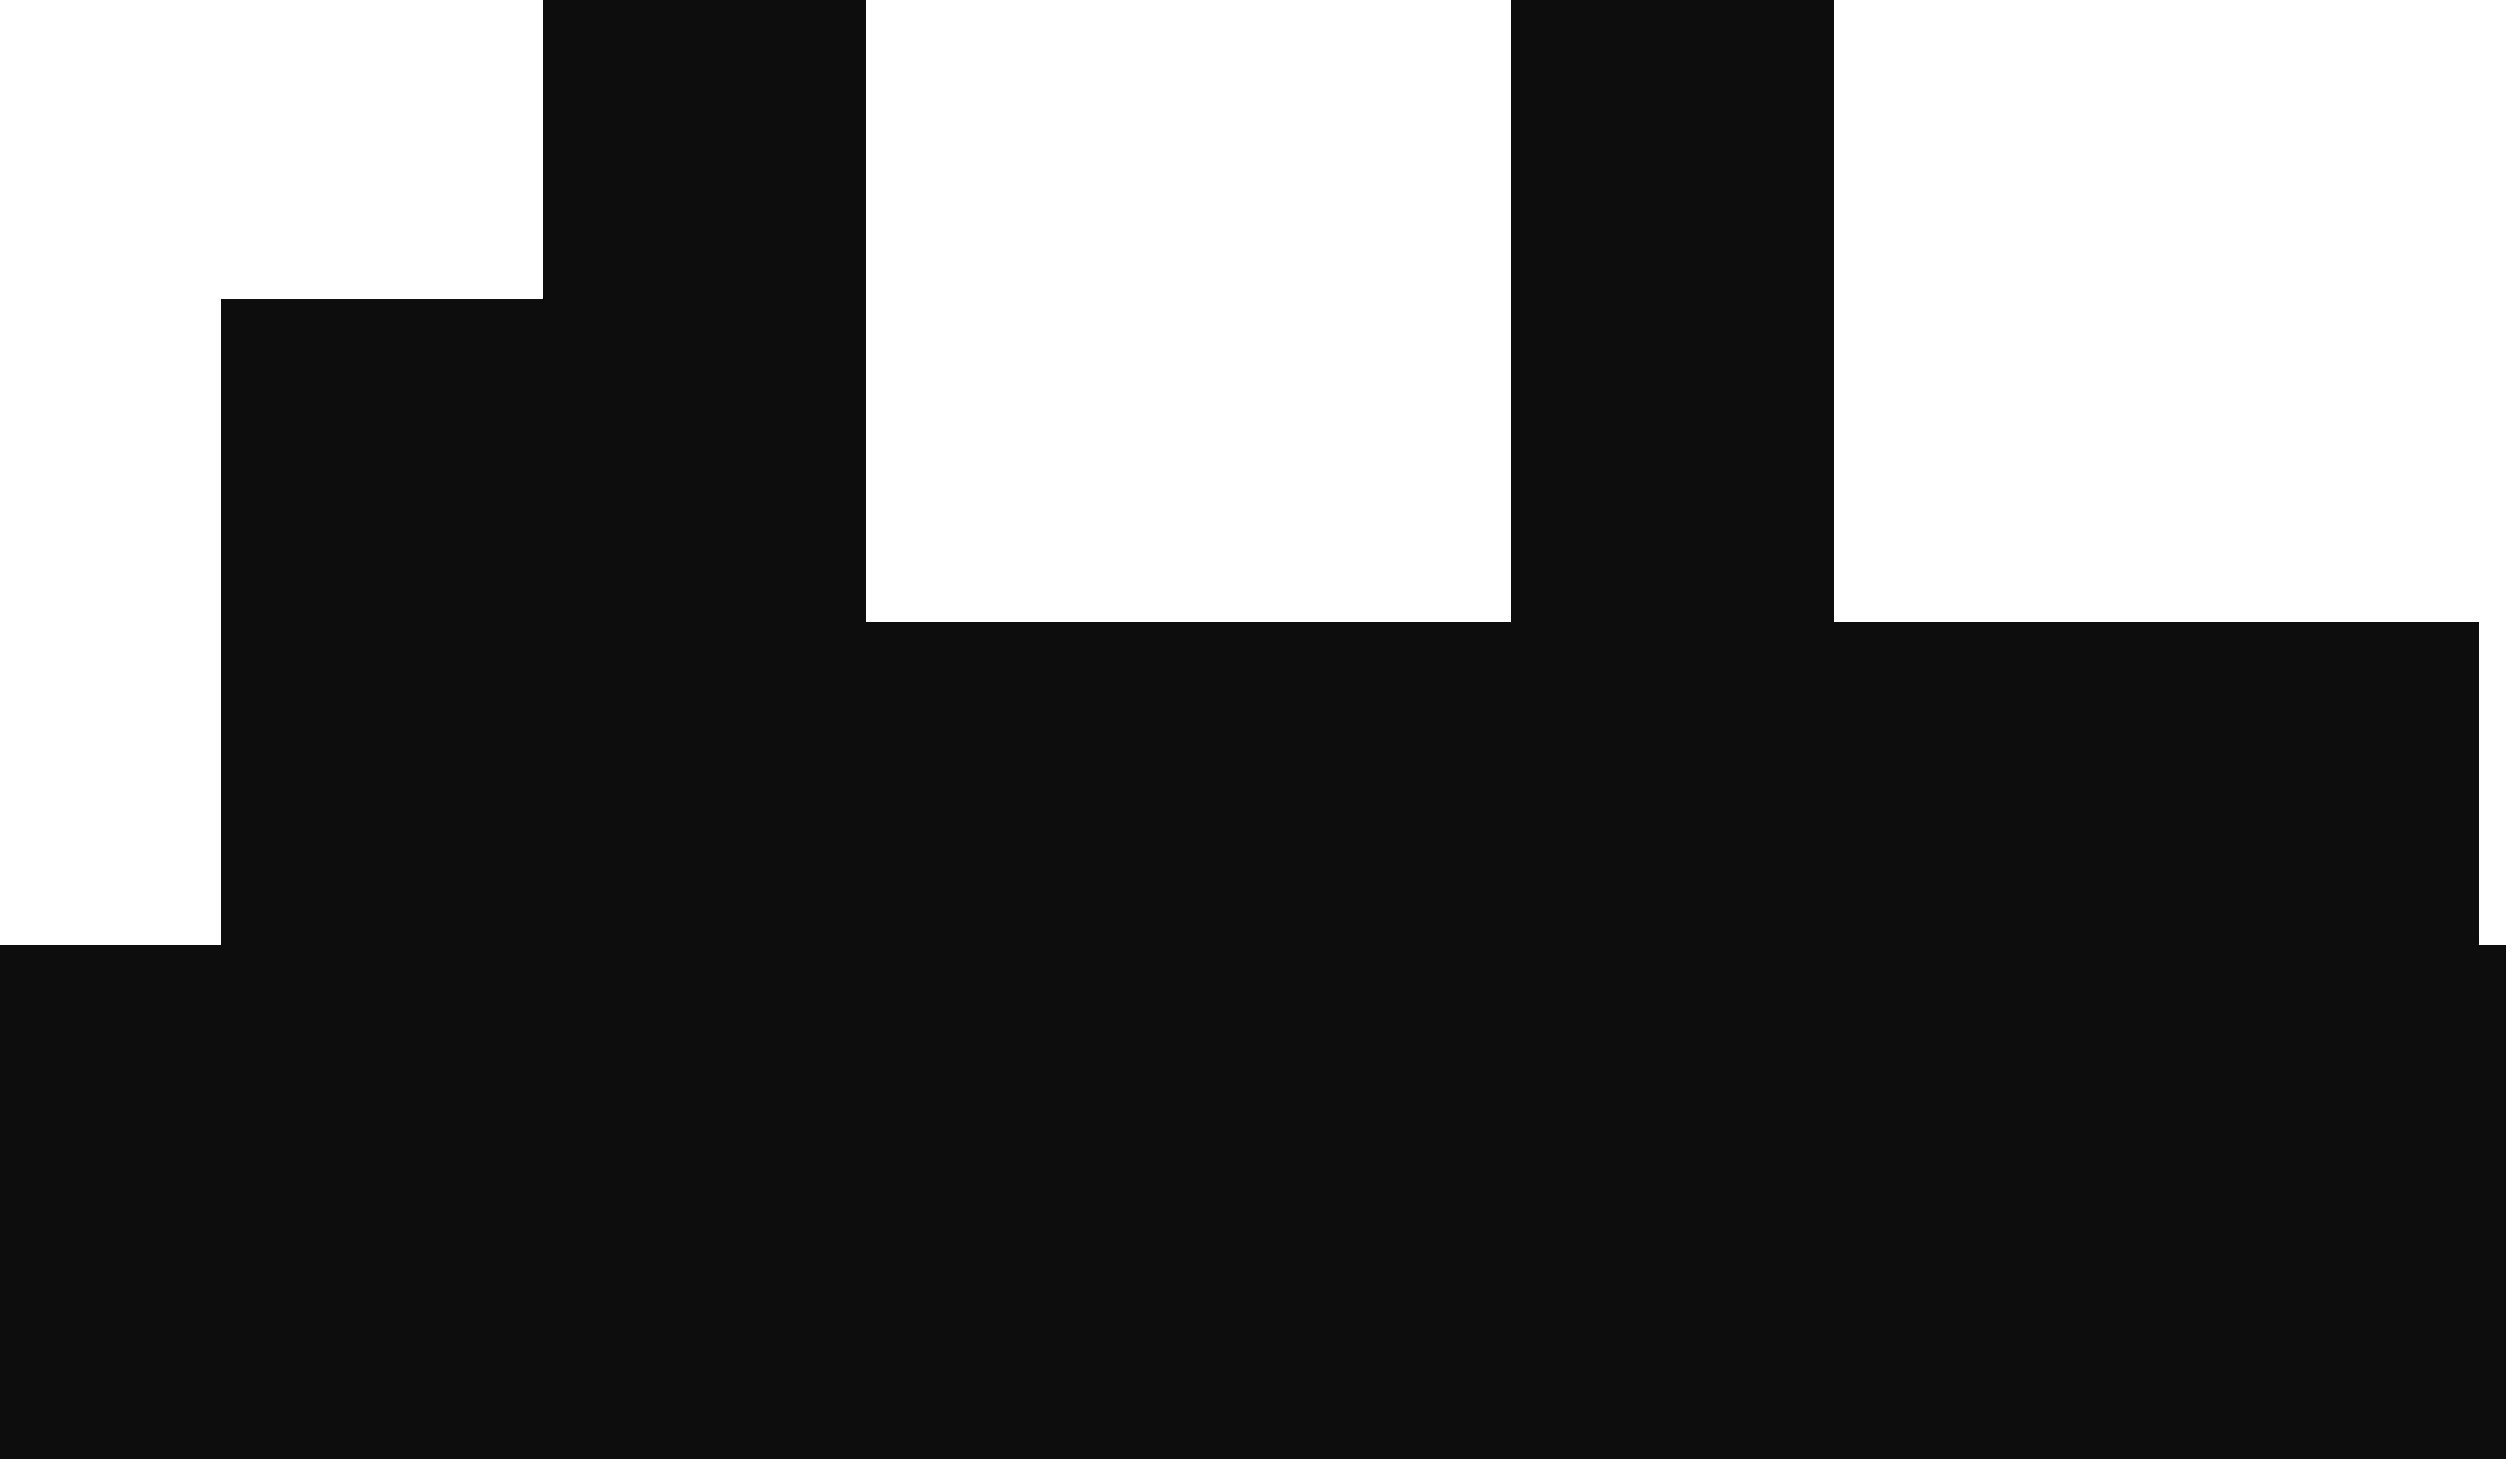 new york city skyline silhouette free at getdrawings com free for rh getdrawings com new york city skyline clipart free nyc skyline clipart free